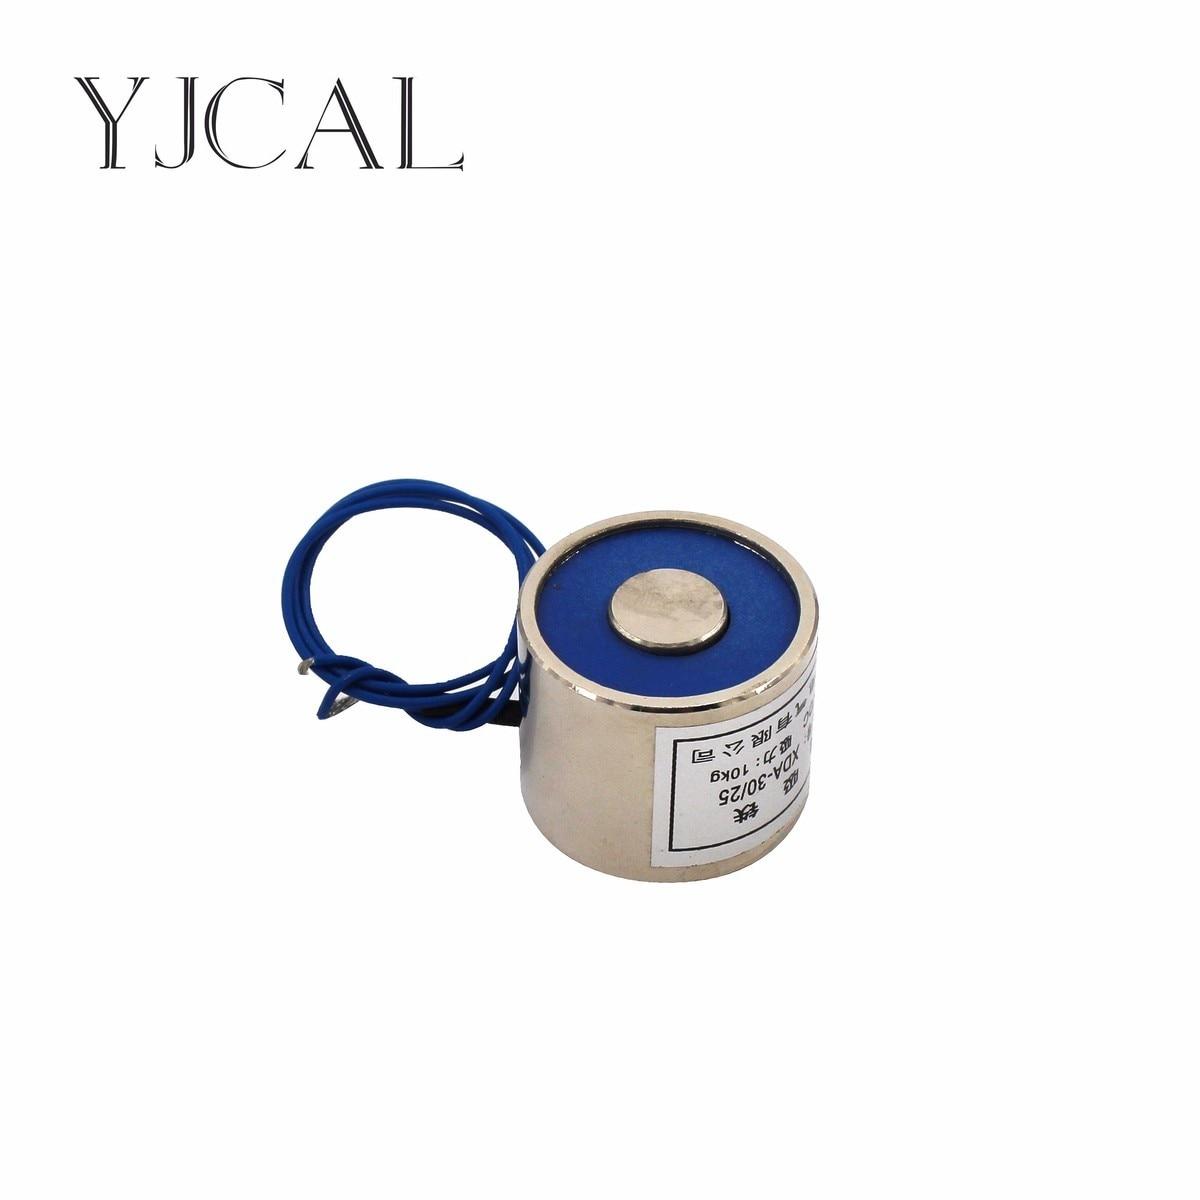 YJ-30/25 DC 12V 24V Circular Micro Holding Electric Magnet Lifting 15KG Solenoid Sucker Electromagnet